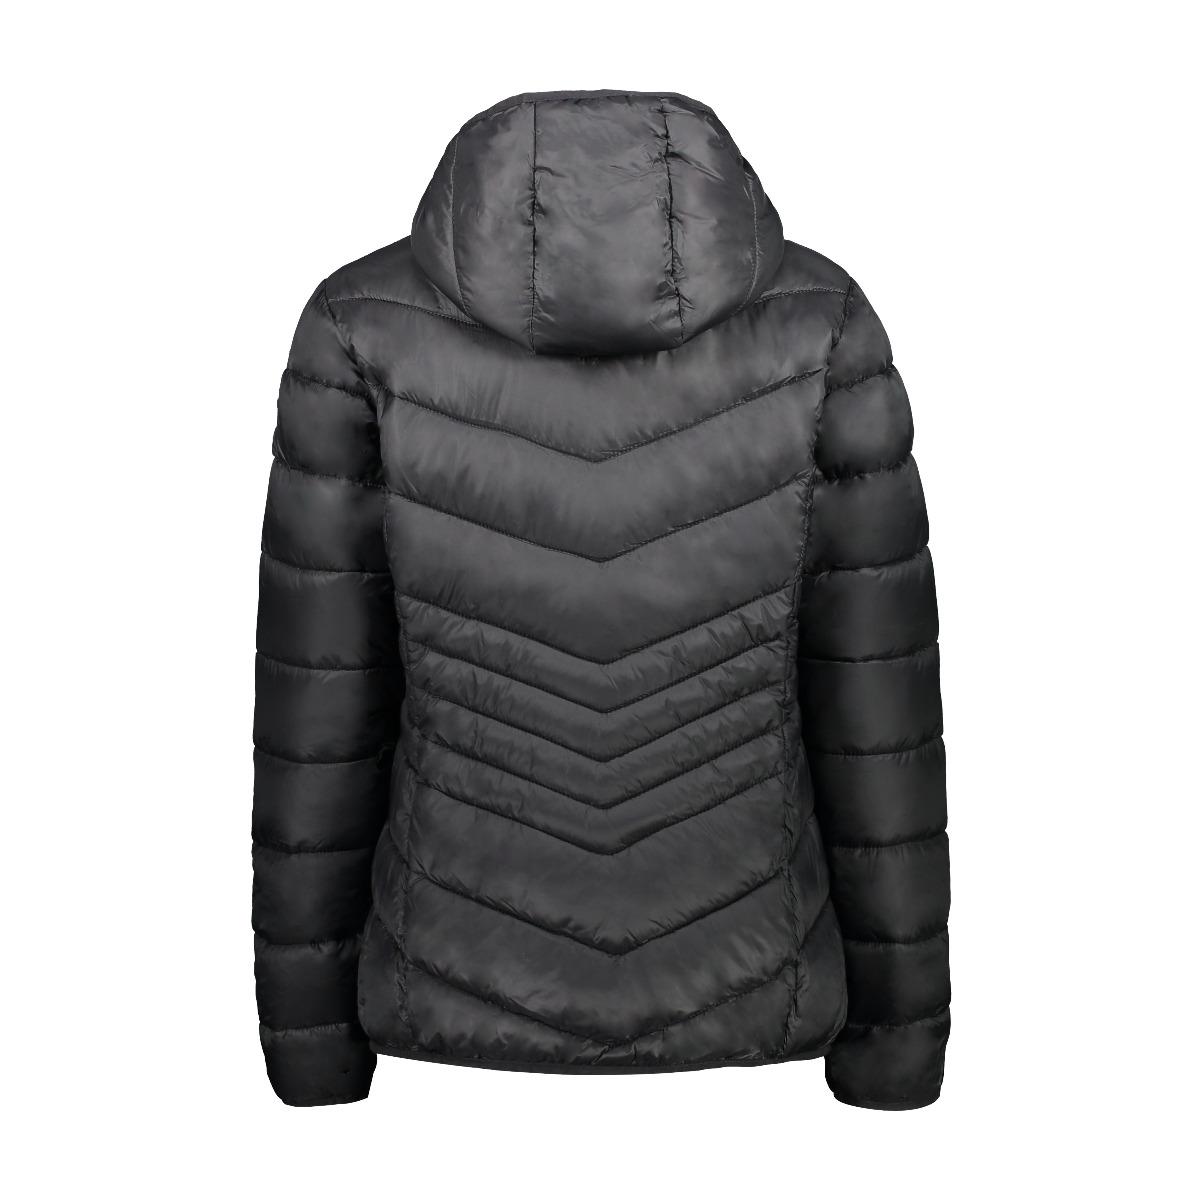 CMP Damen Packable Jacke mit Kapuze 30K3656-U901